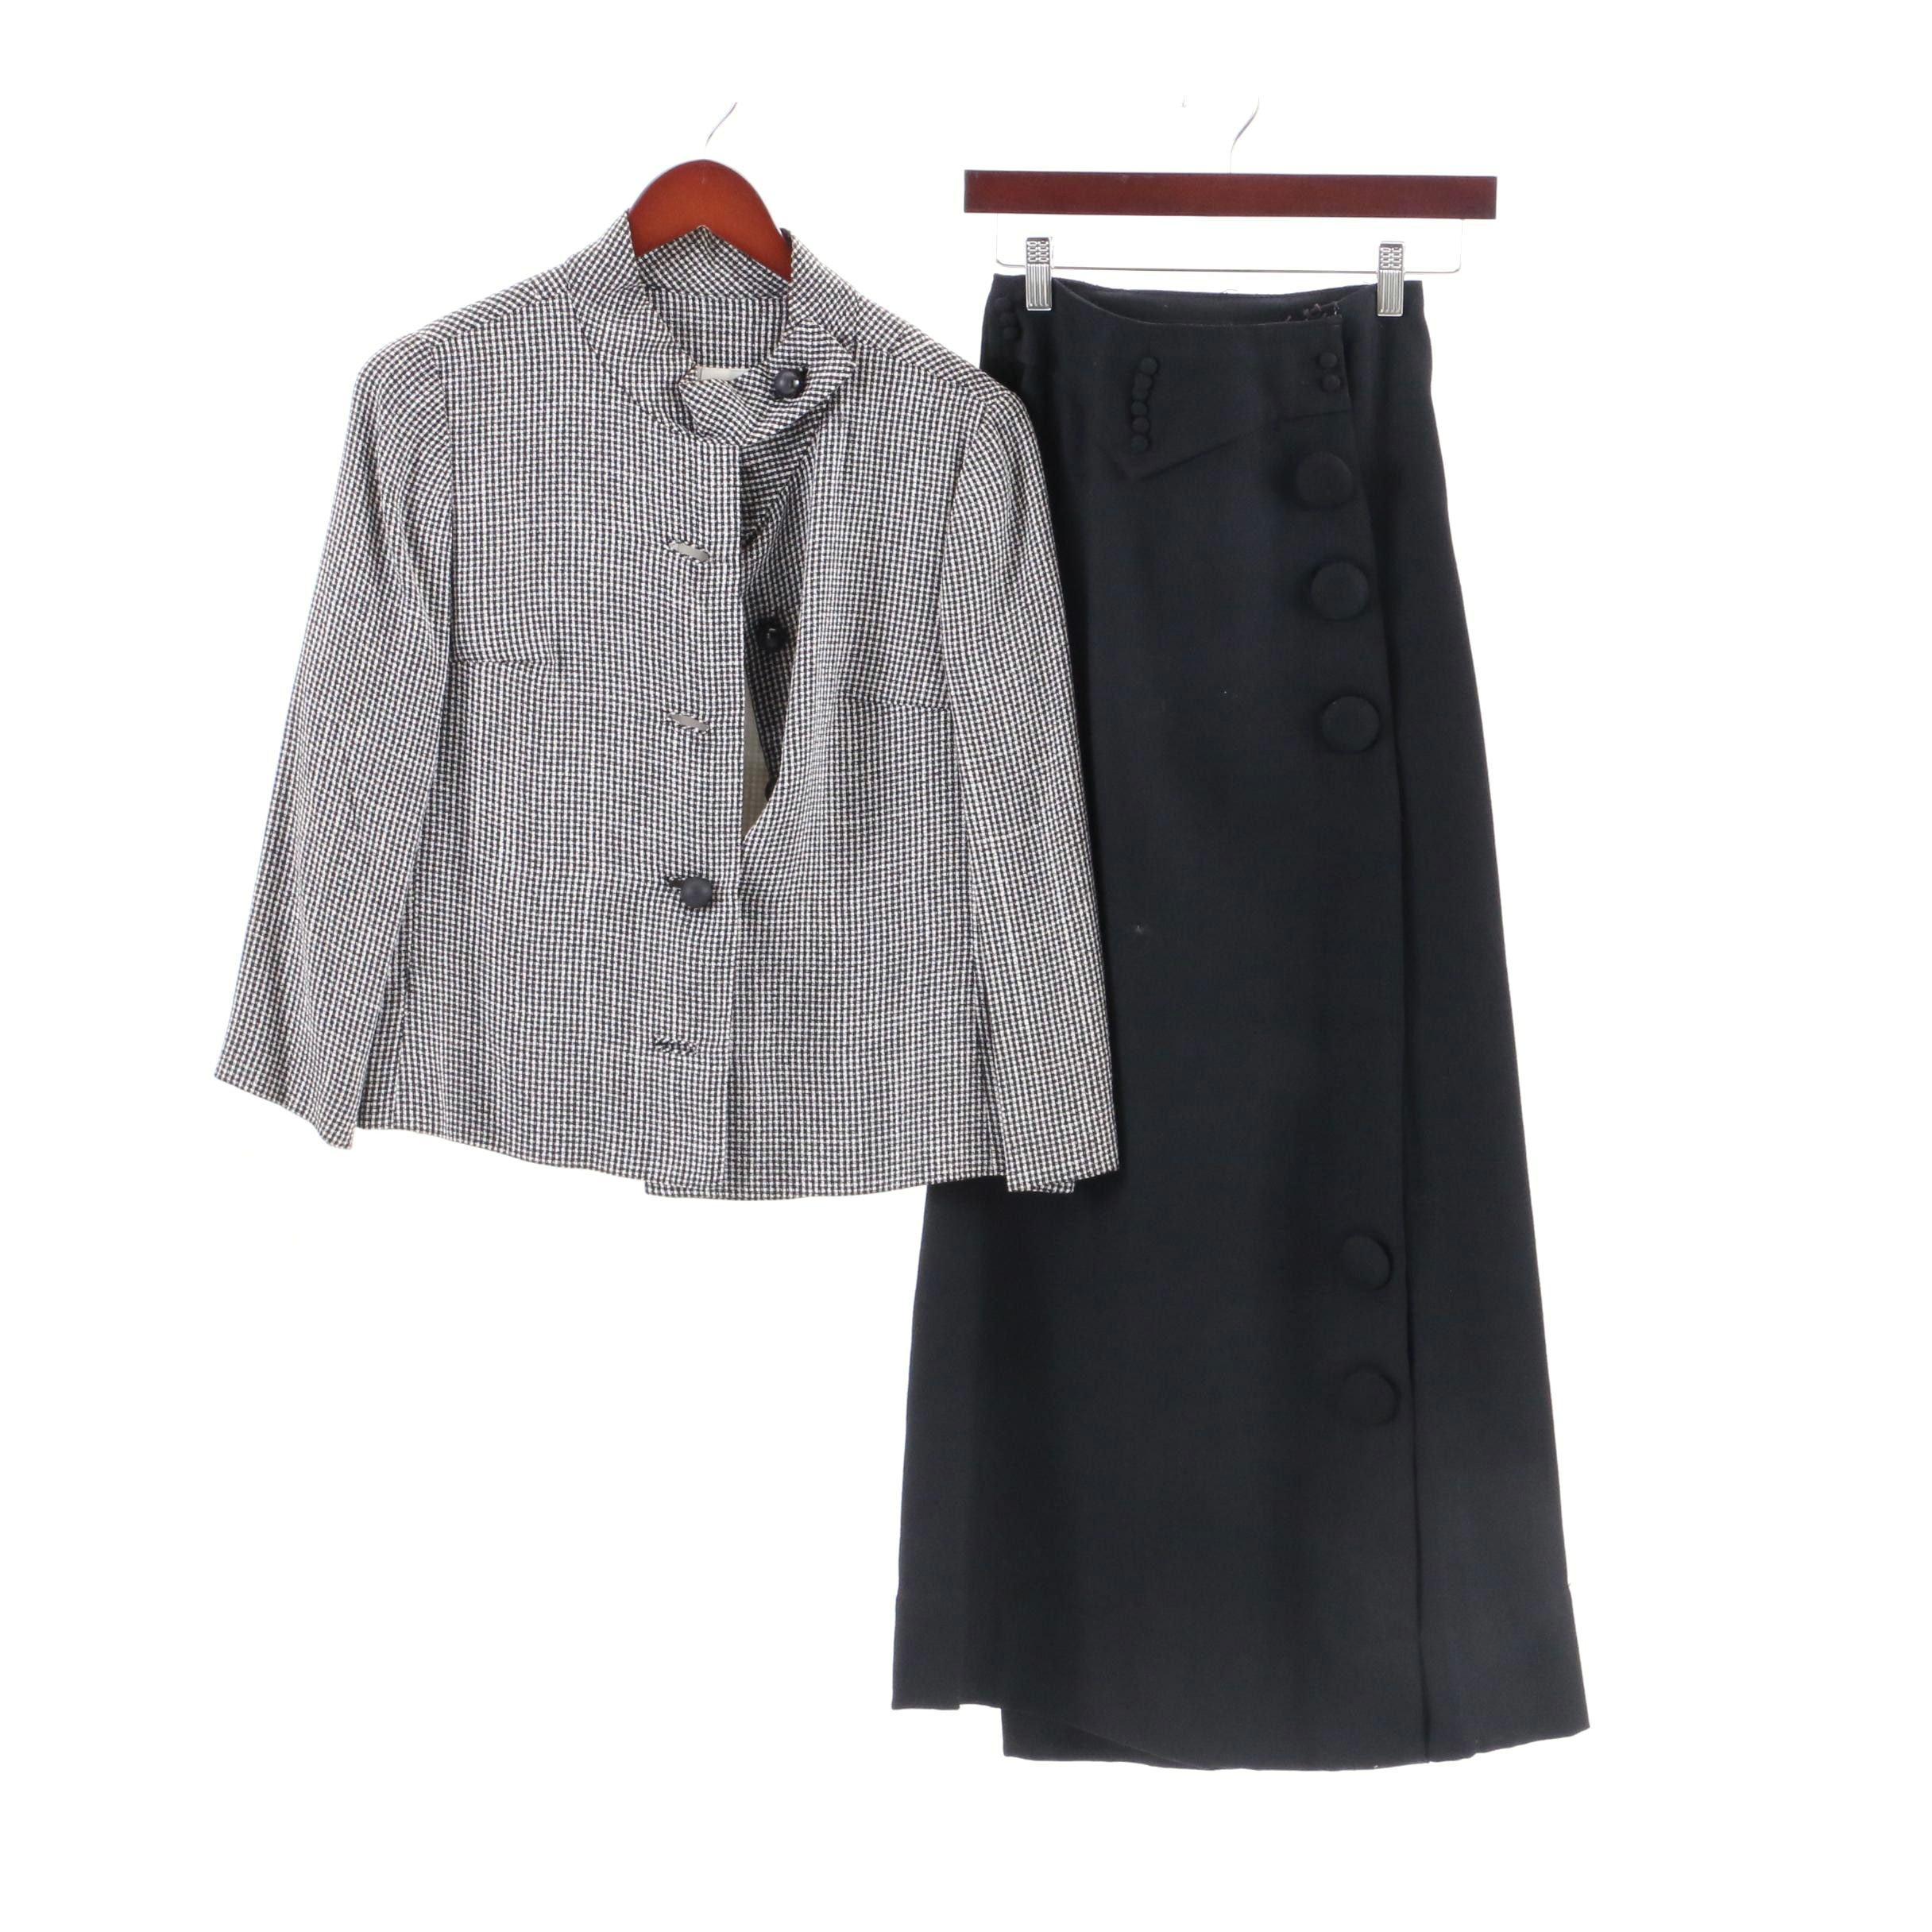 Circa 1950s Vintage Hal Leurs  Jacket and Black Skirt